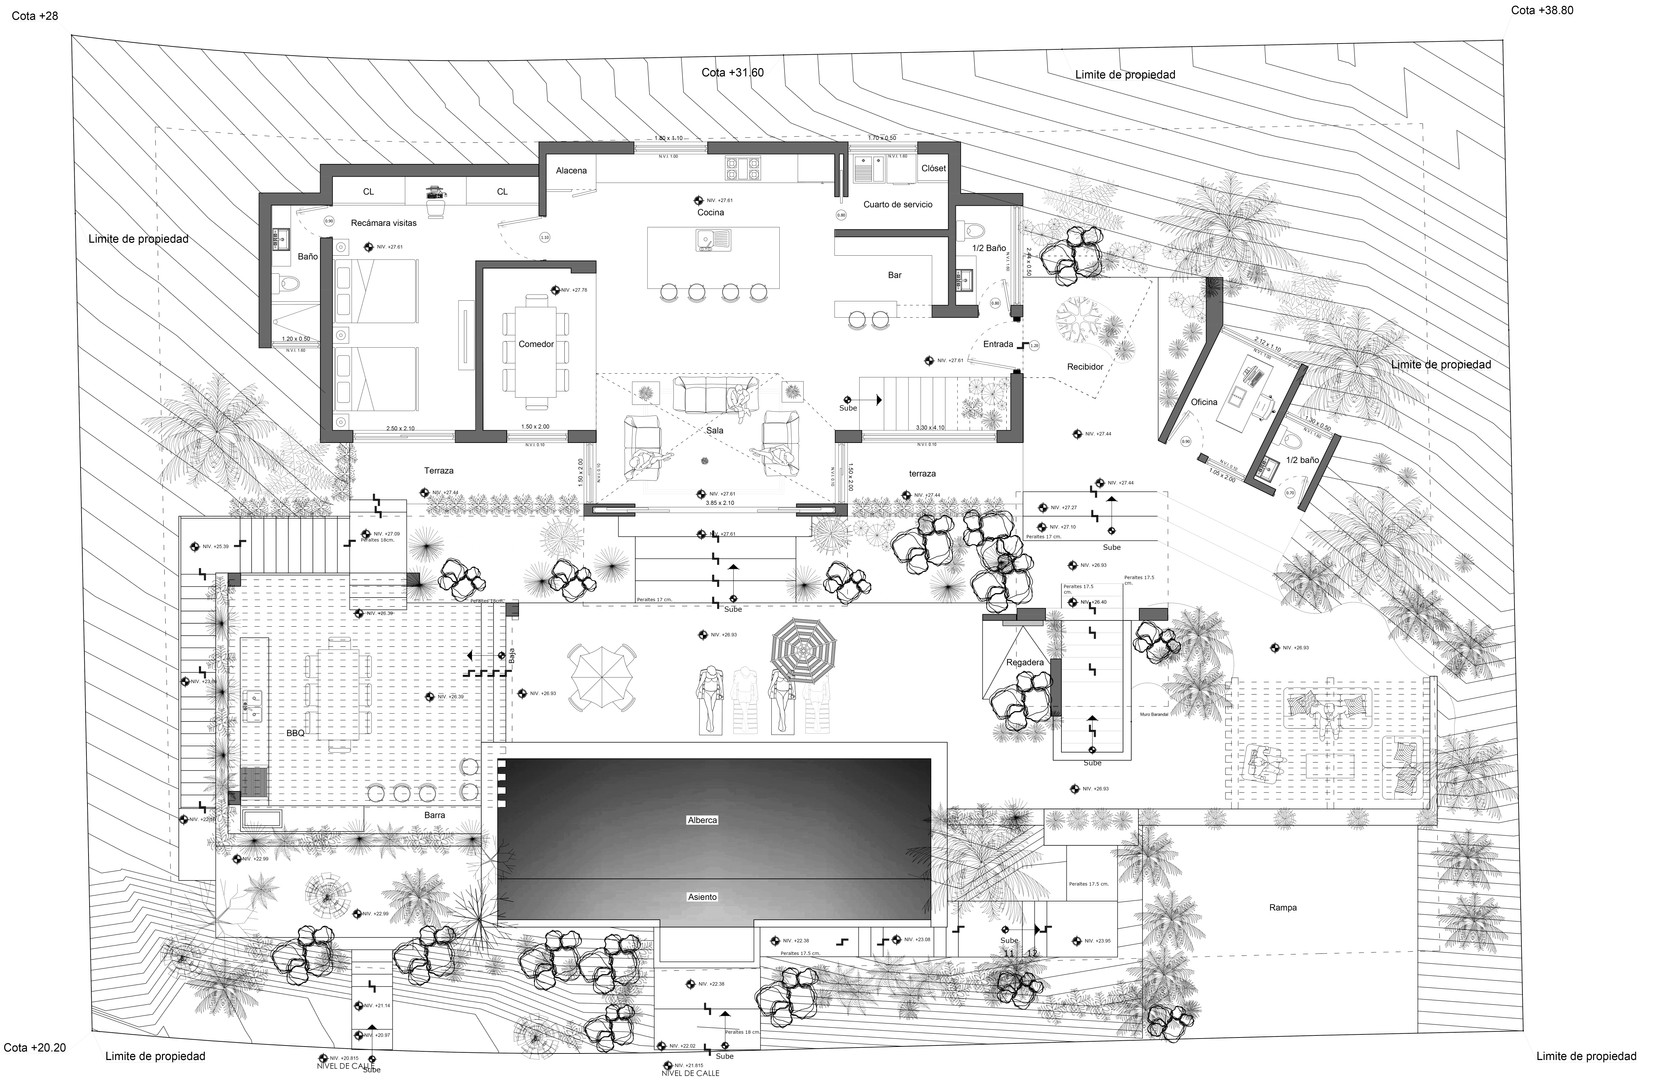 Arquitectonico version 4 Serna.jpg